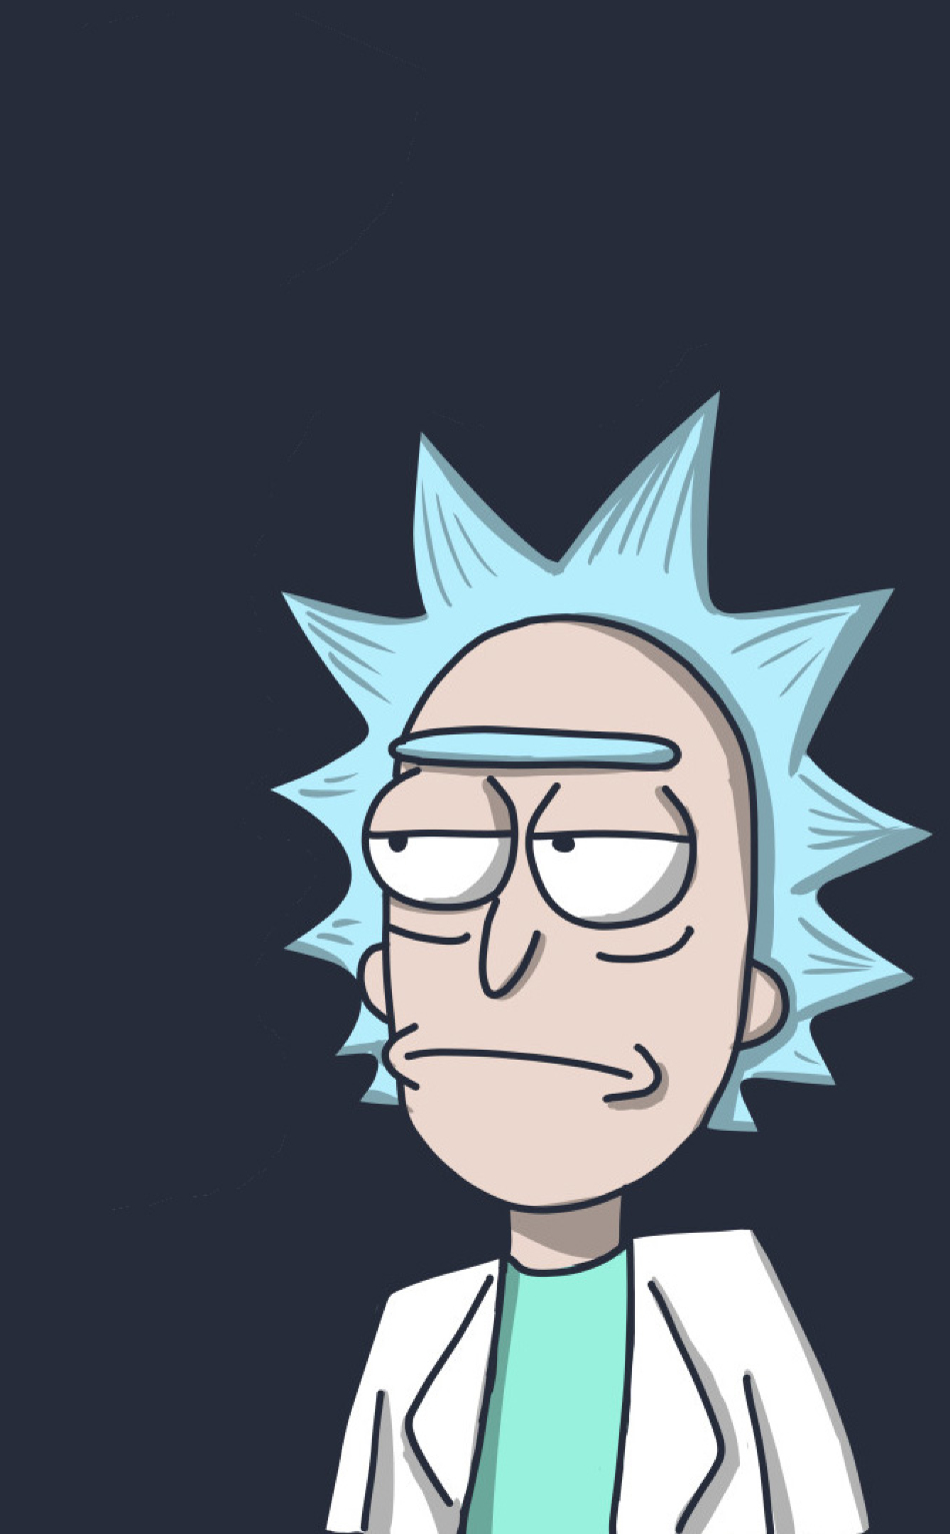 Rick In Rick And Morty Full Hd Wallpaper